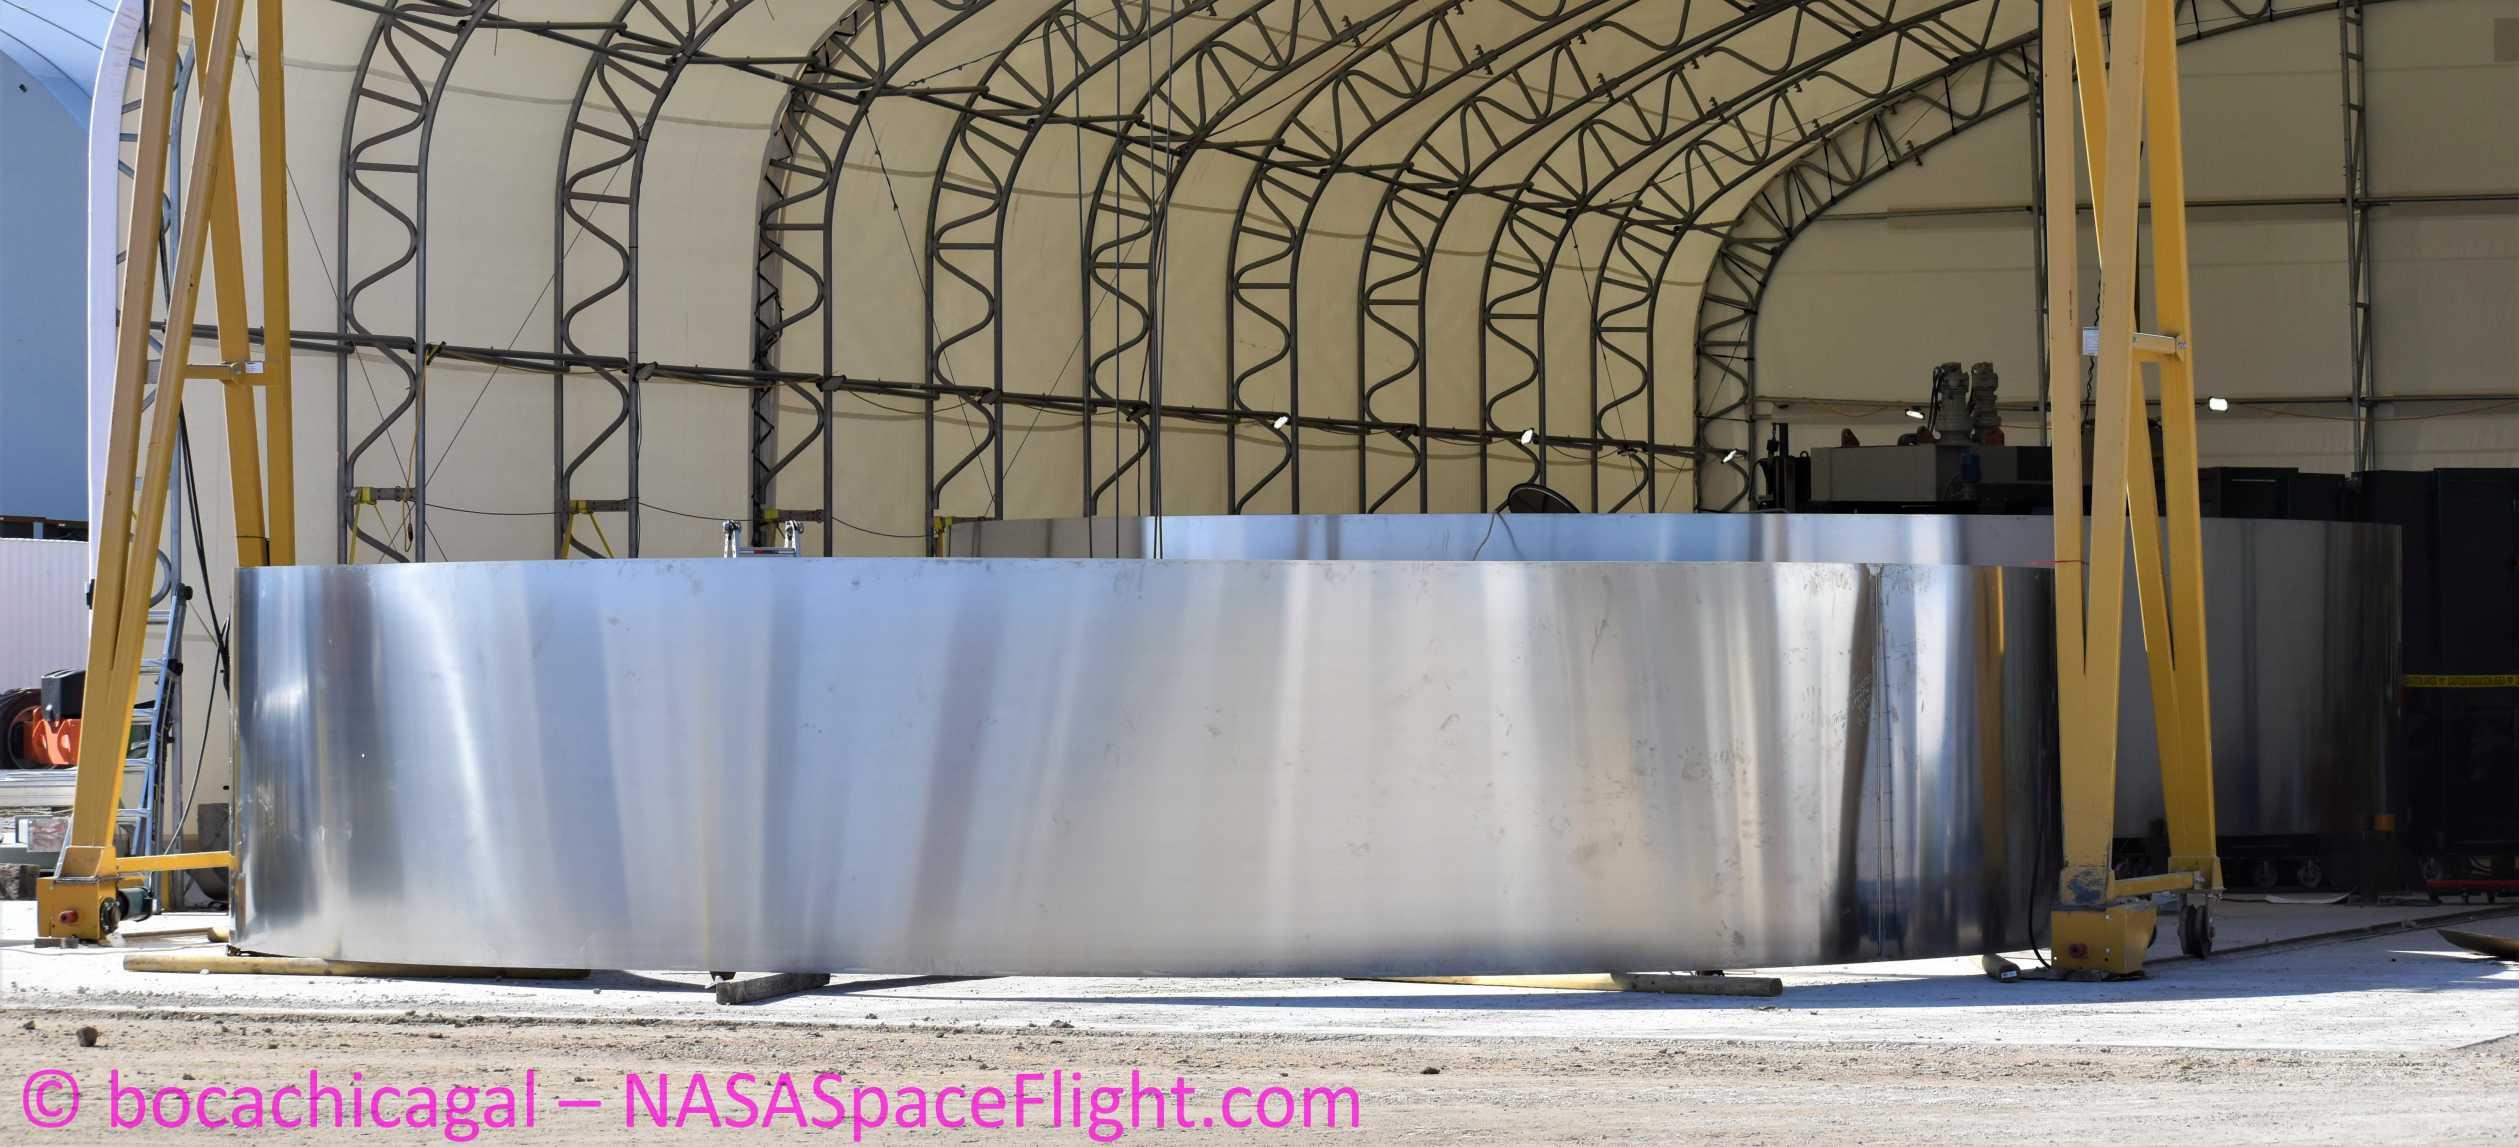 Starship Boca Chica 020220 (NASASpaceflight – bocachicagal) SN01 rings 1 crop (c)